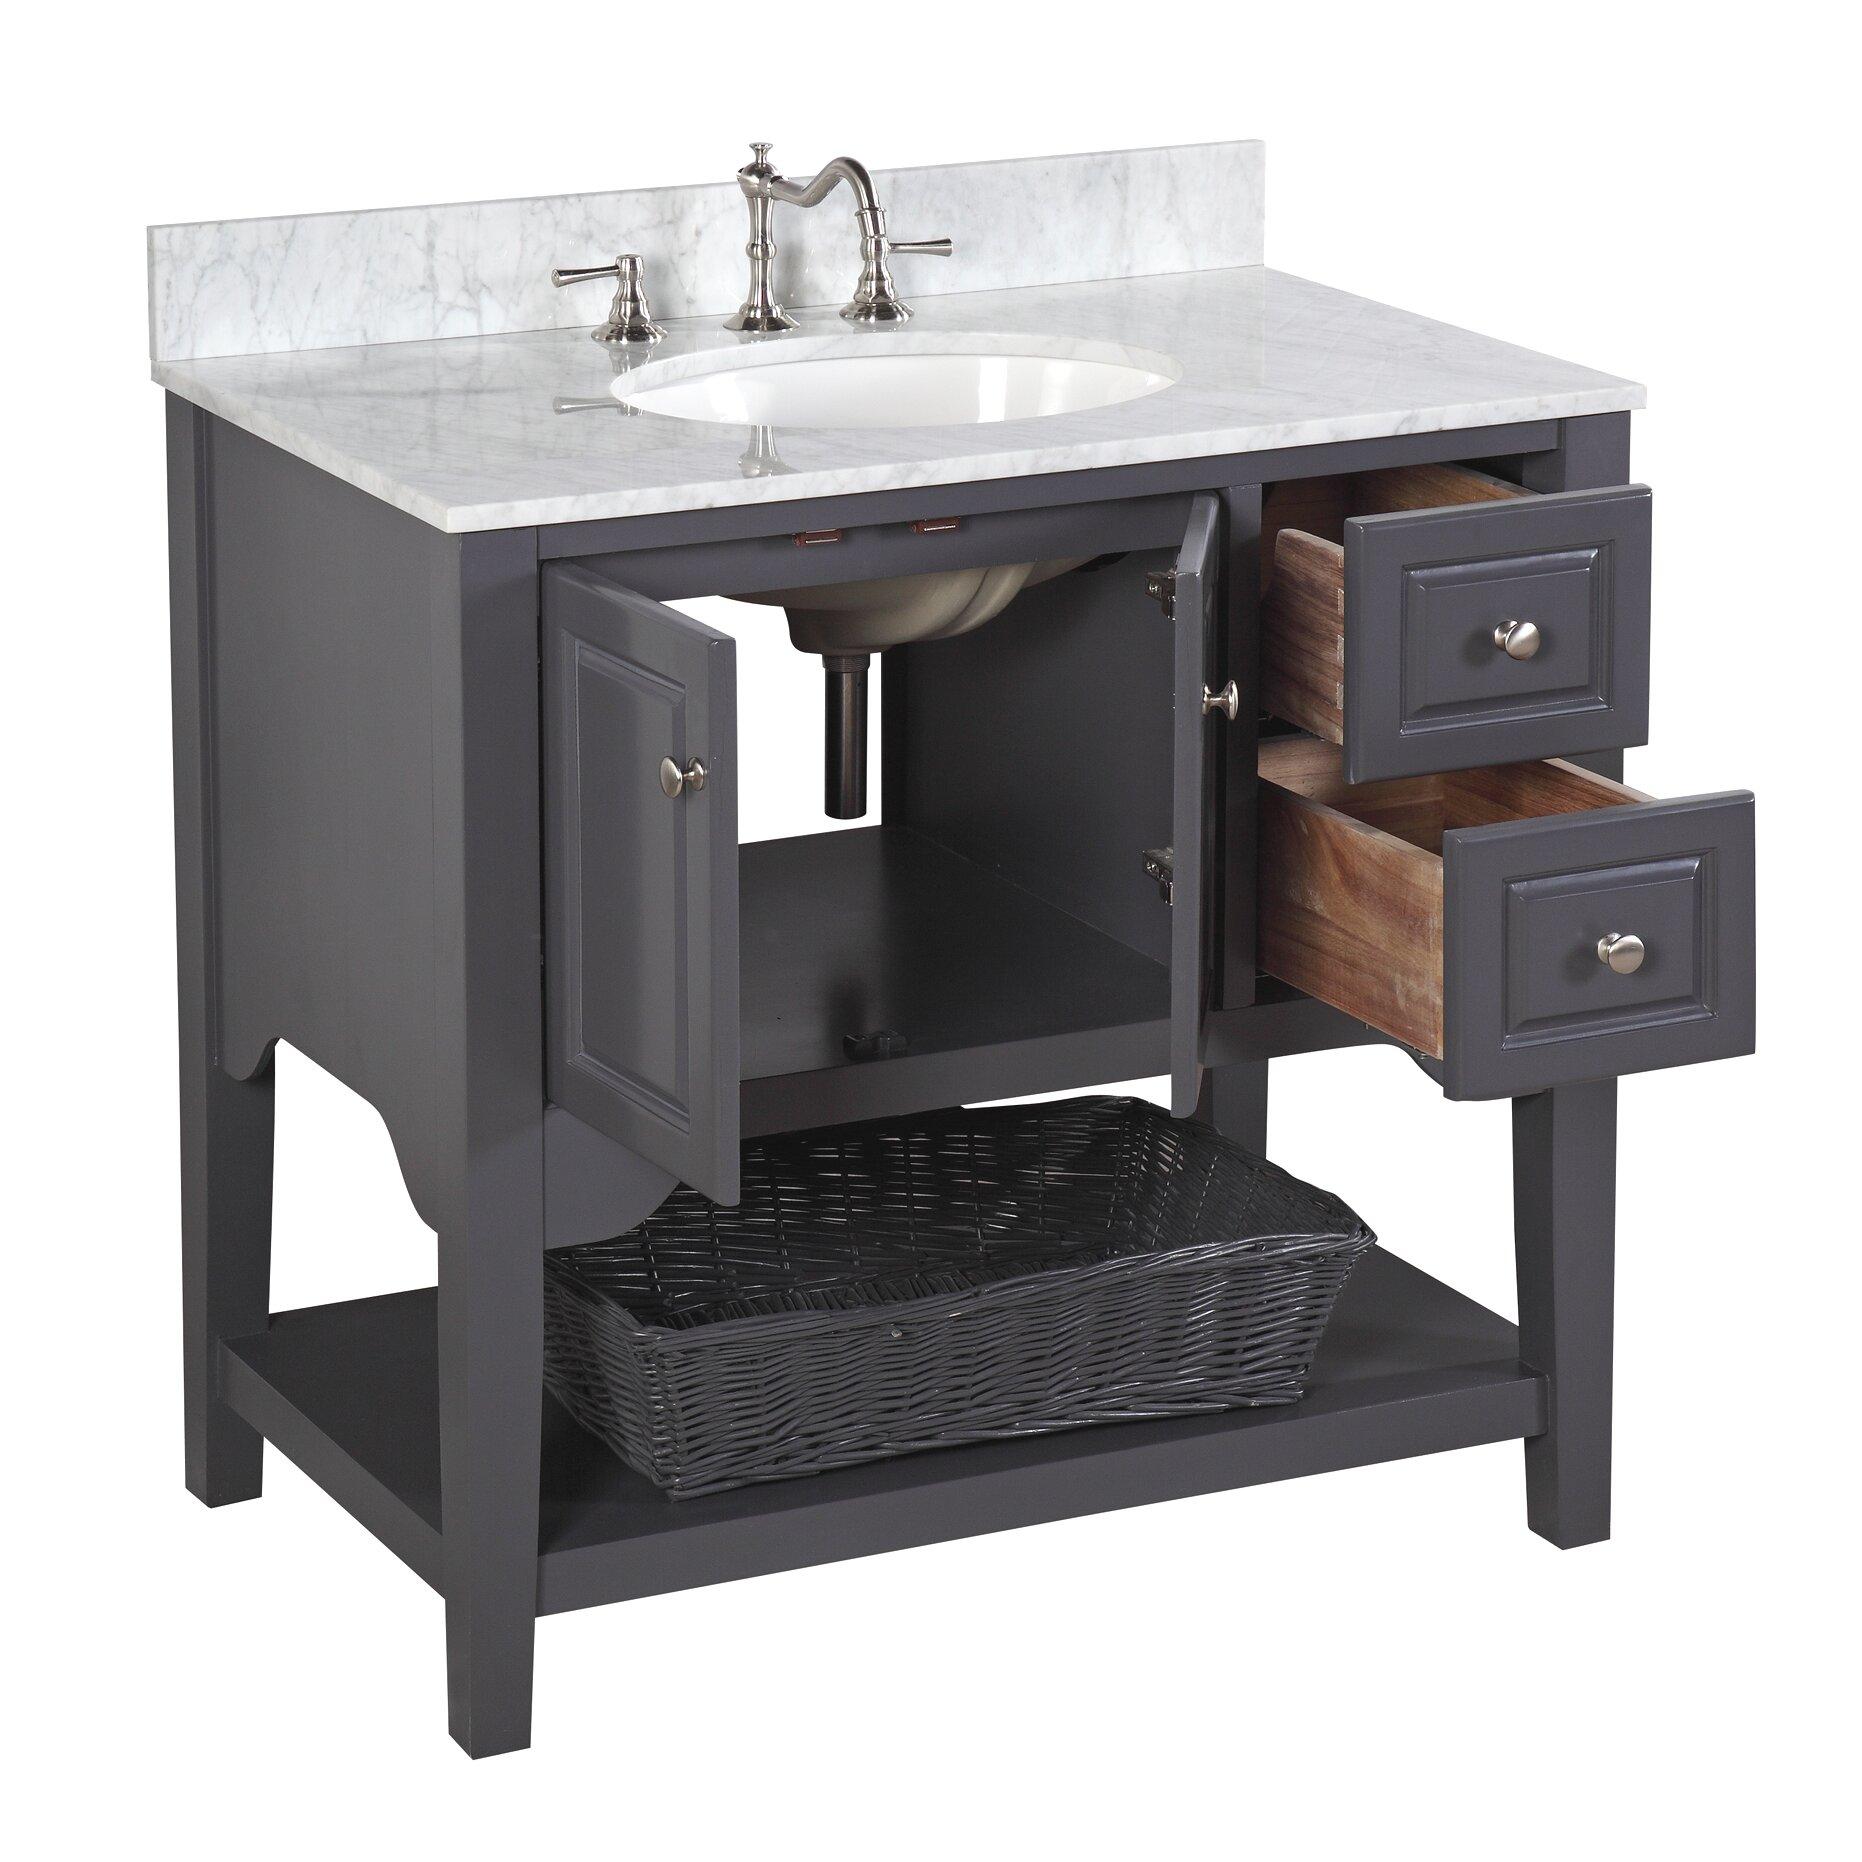 "Kitchen Bathroom Storage Cabinet Floor Stand White Wood: KBC Washington 36"" Single Bathroom Vanity Set & Reviews"